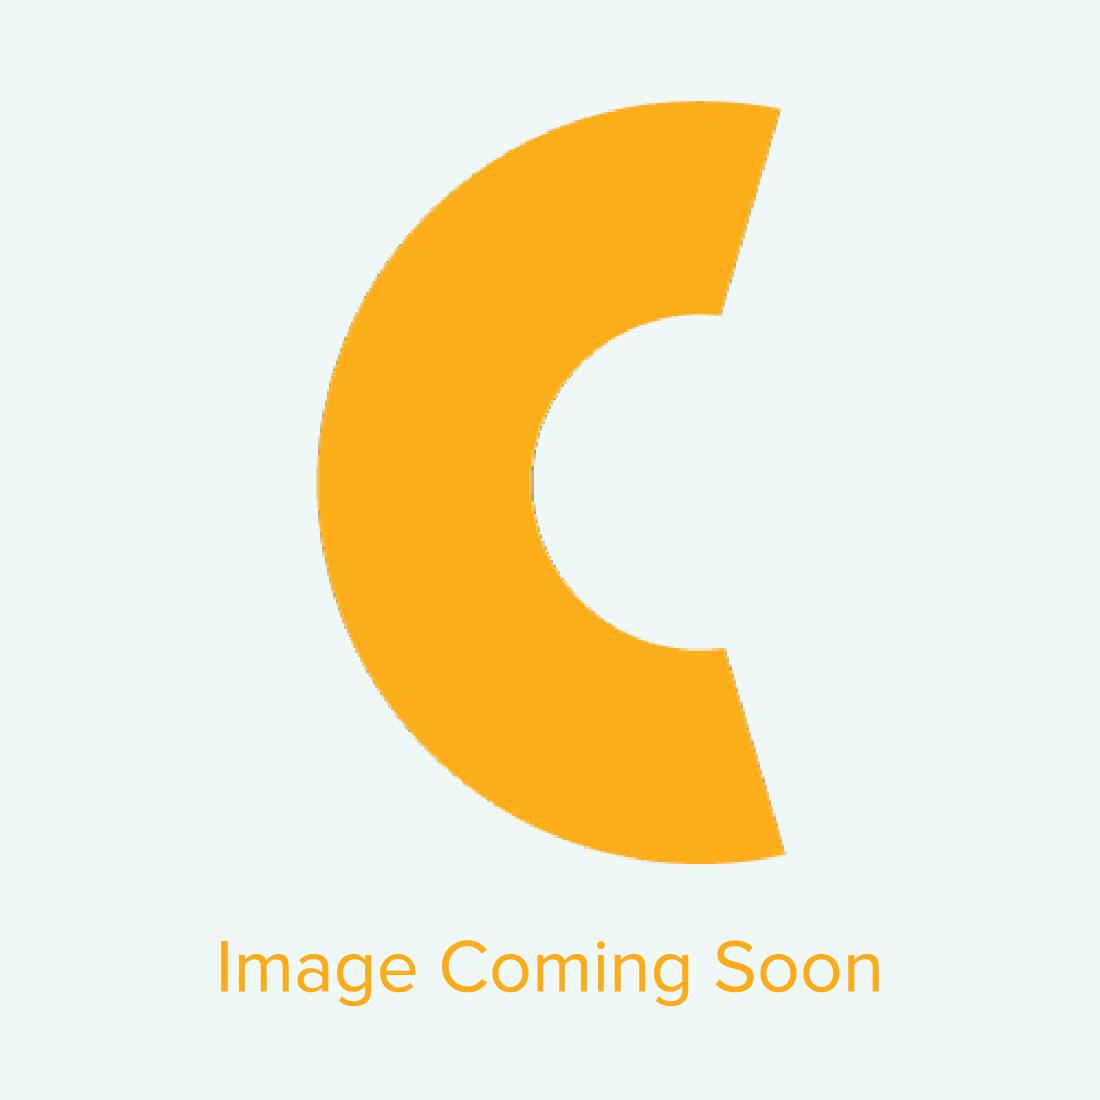 photograph regarding Siser Colorprint Easy Printable Heat Transfer Vinyl named ColorPrint PU Matte Printable Warm Shift Vinyl